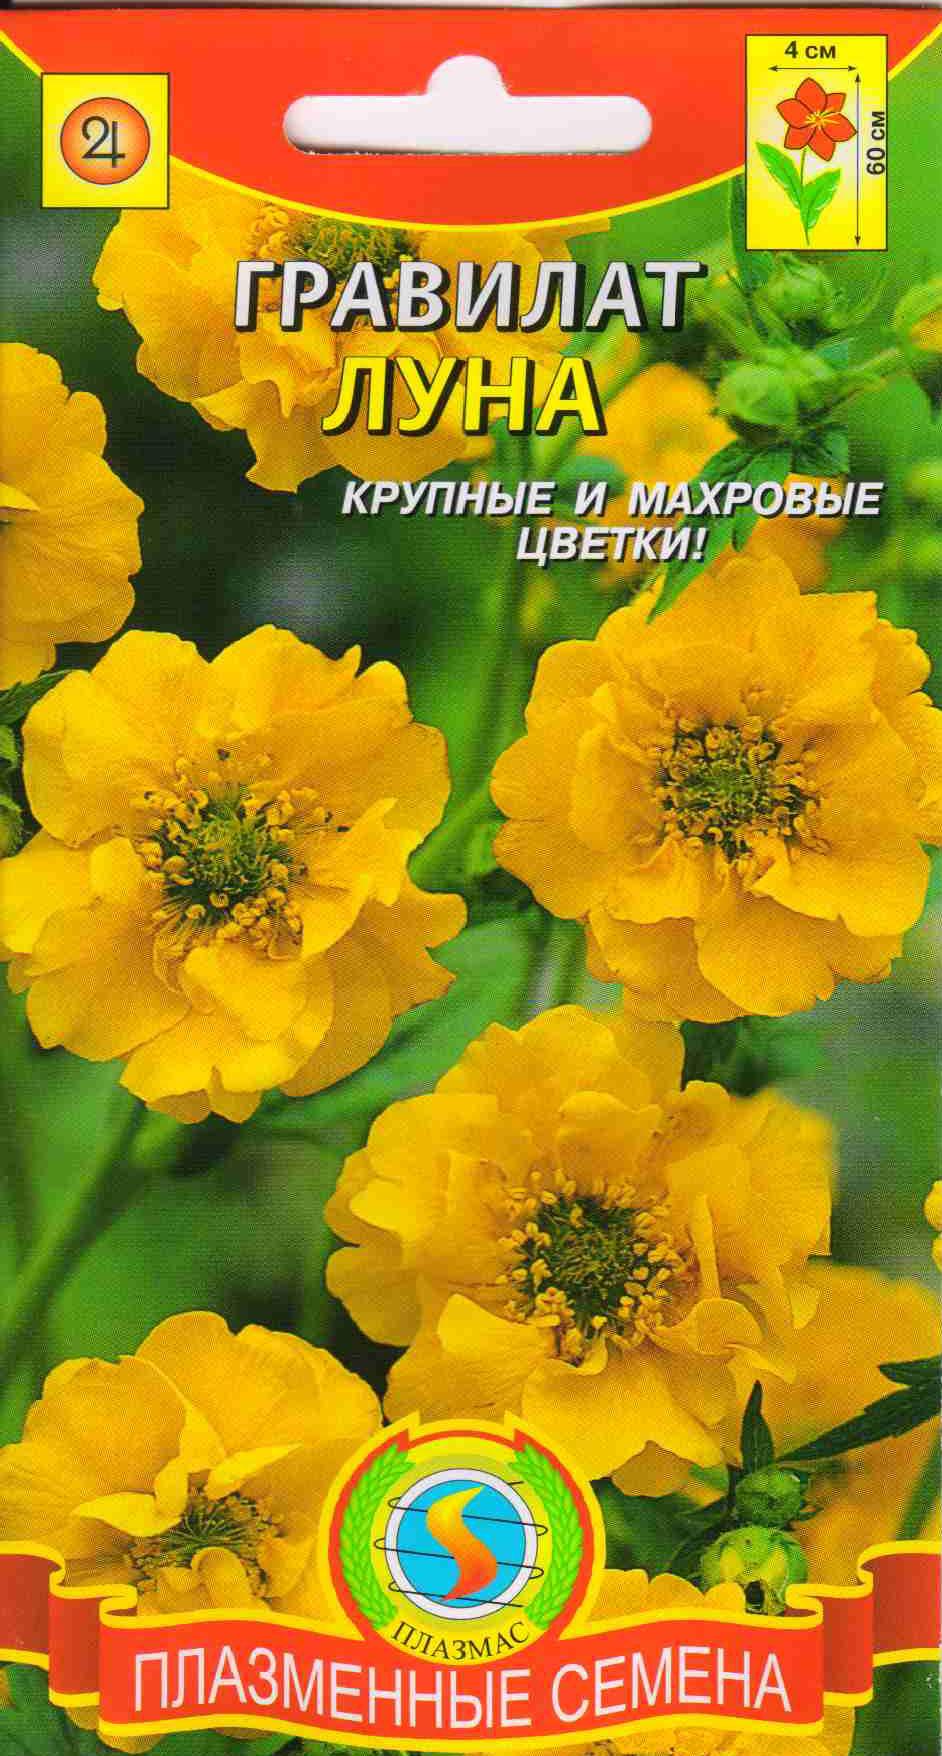 Каталог и описание многолетних цветов фото